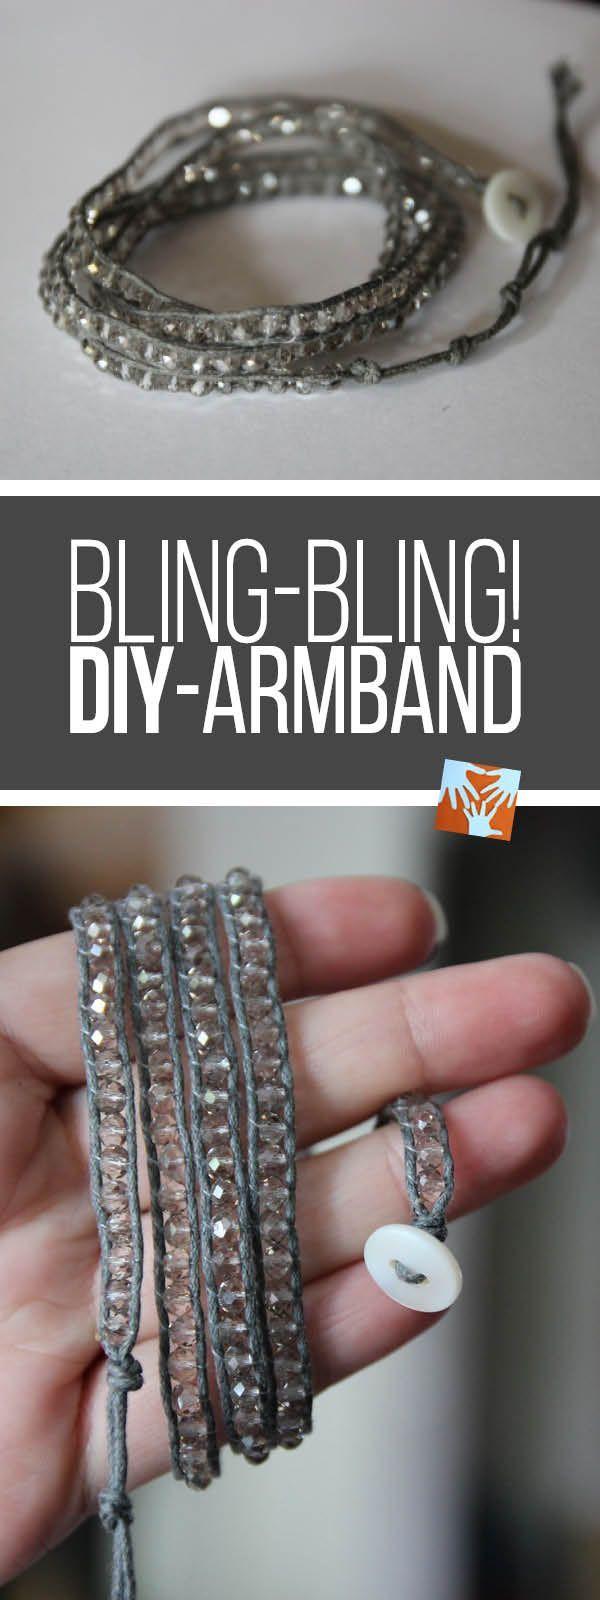 Bling-Bling! Einfaches DIY-Armband mit Wow!-Effekt – Mamablogger – die Pinterest Gruppe